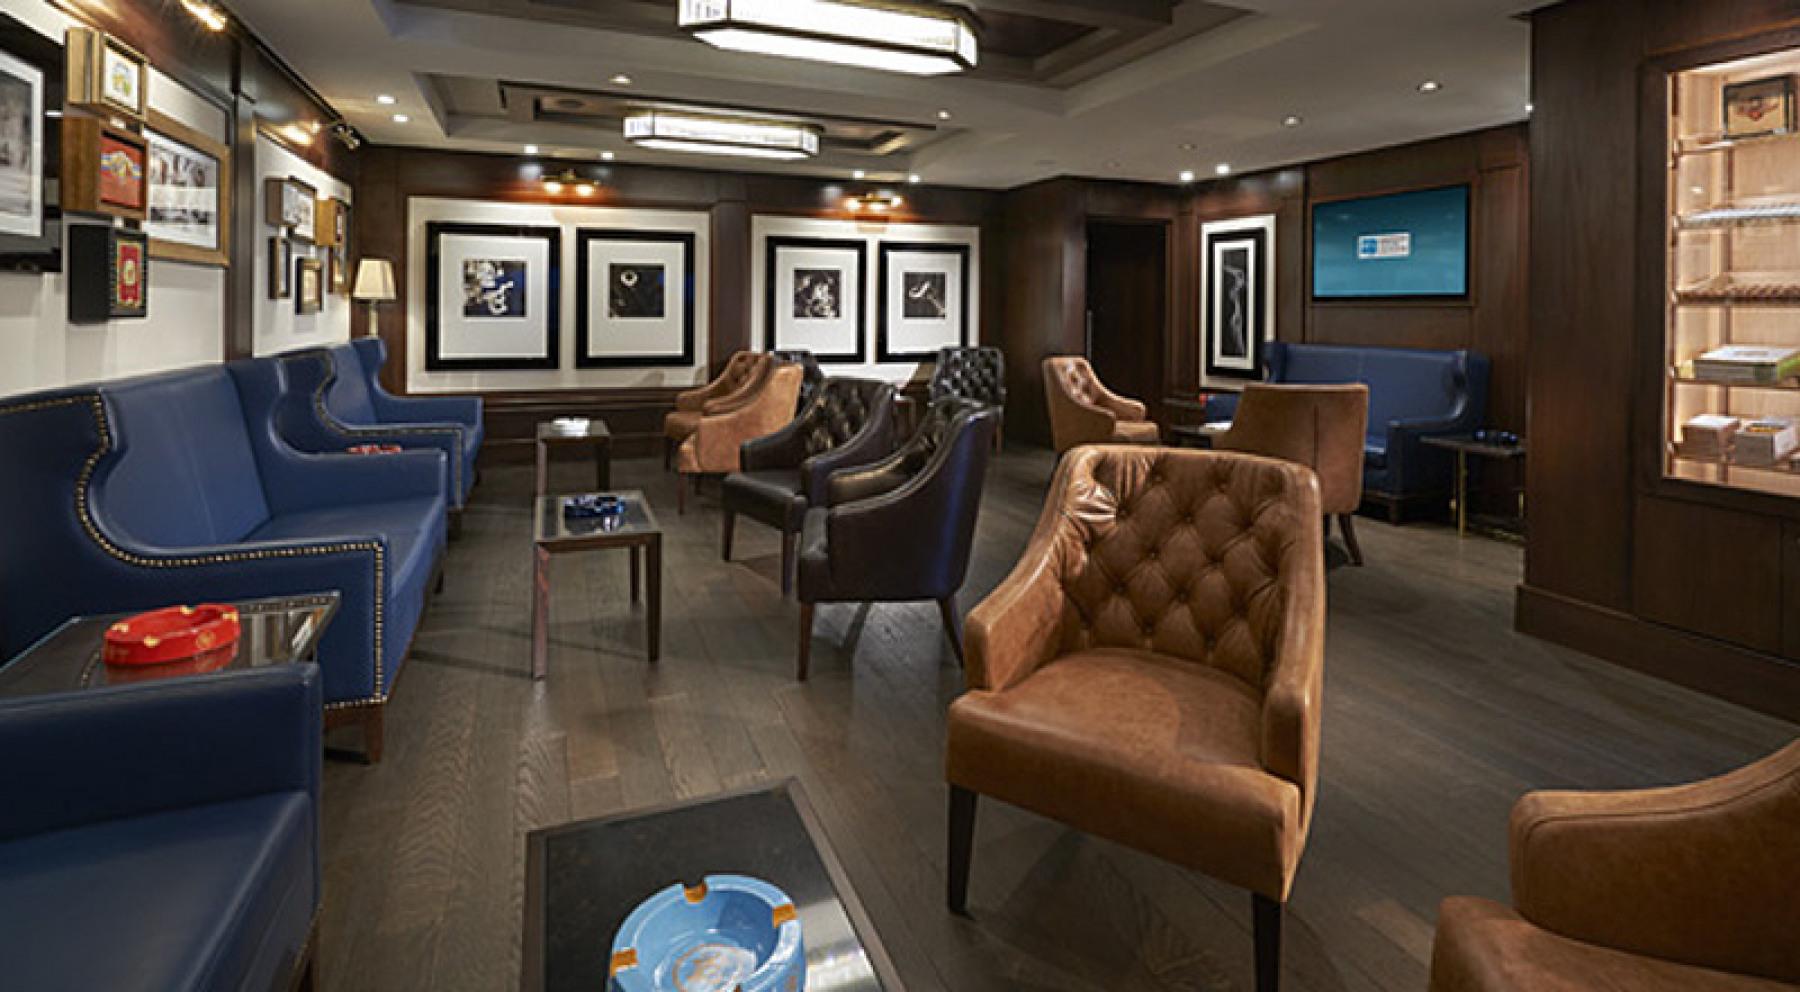 Norwegian Cruise Lines Norwegian Joy Interior Humidor Cigar Lounge.jpg